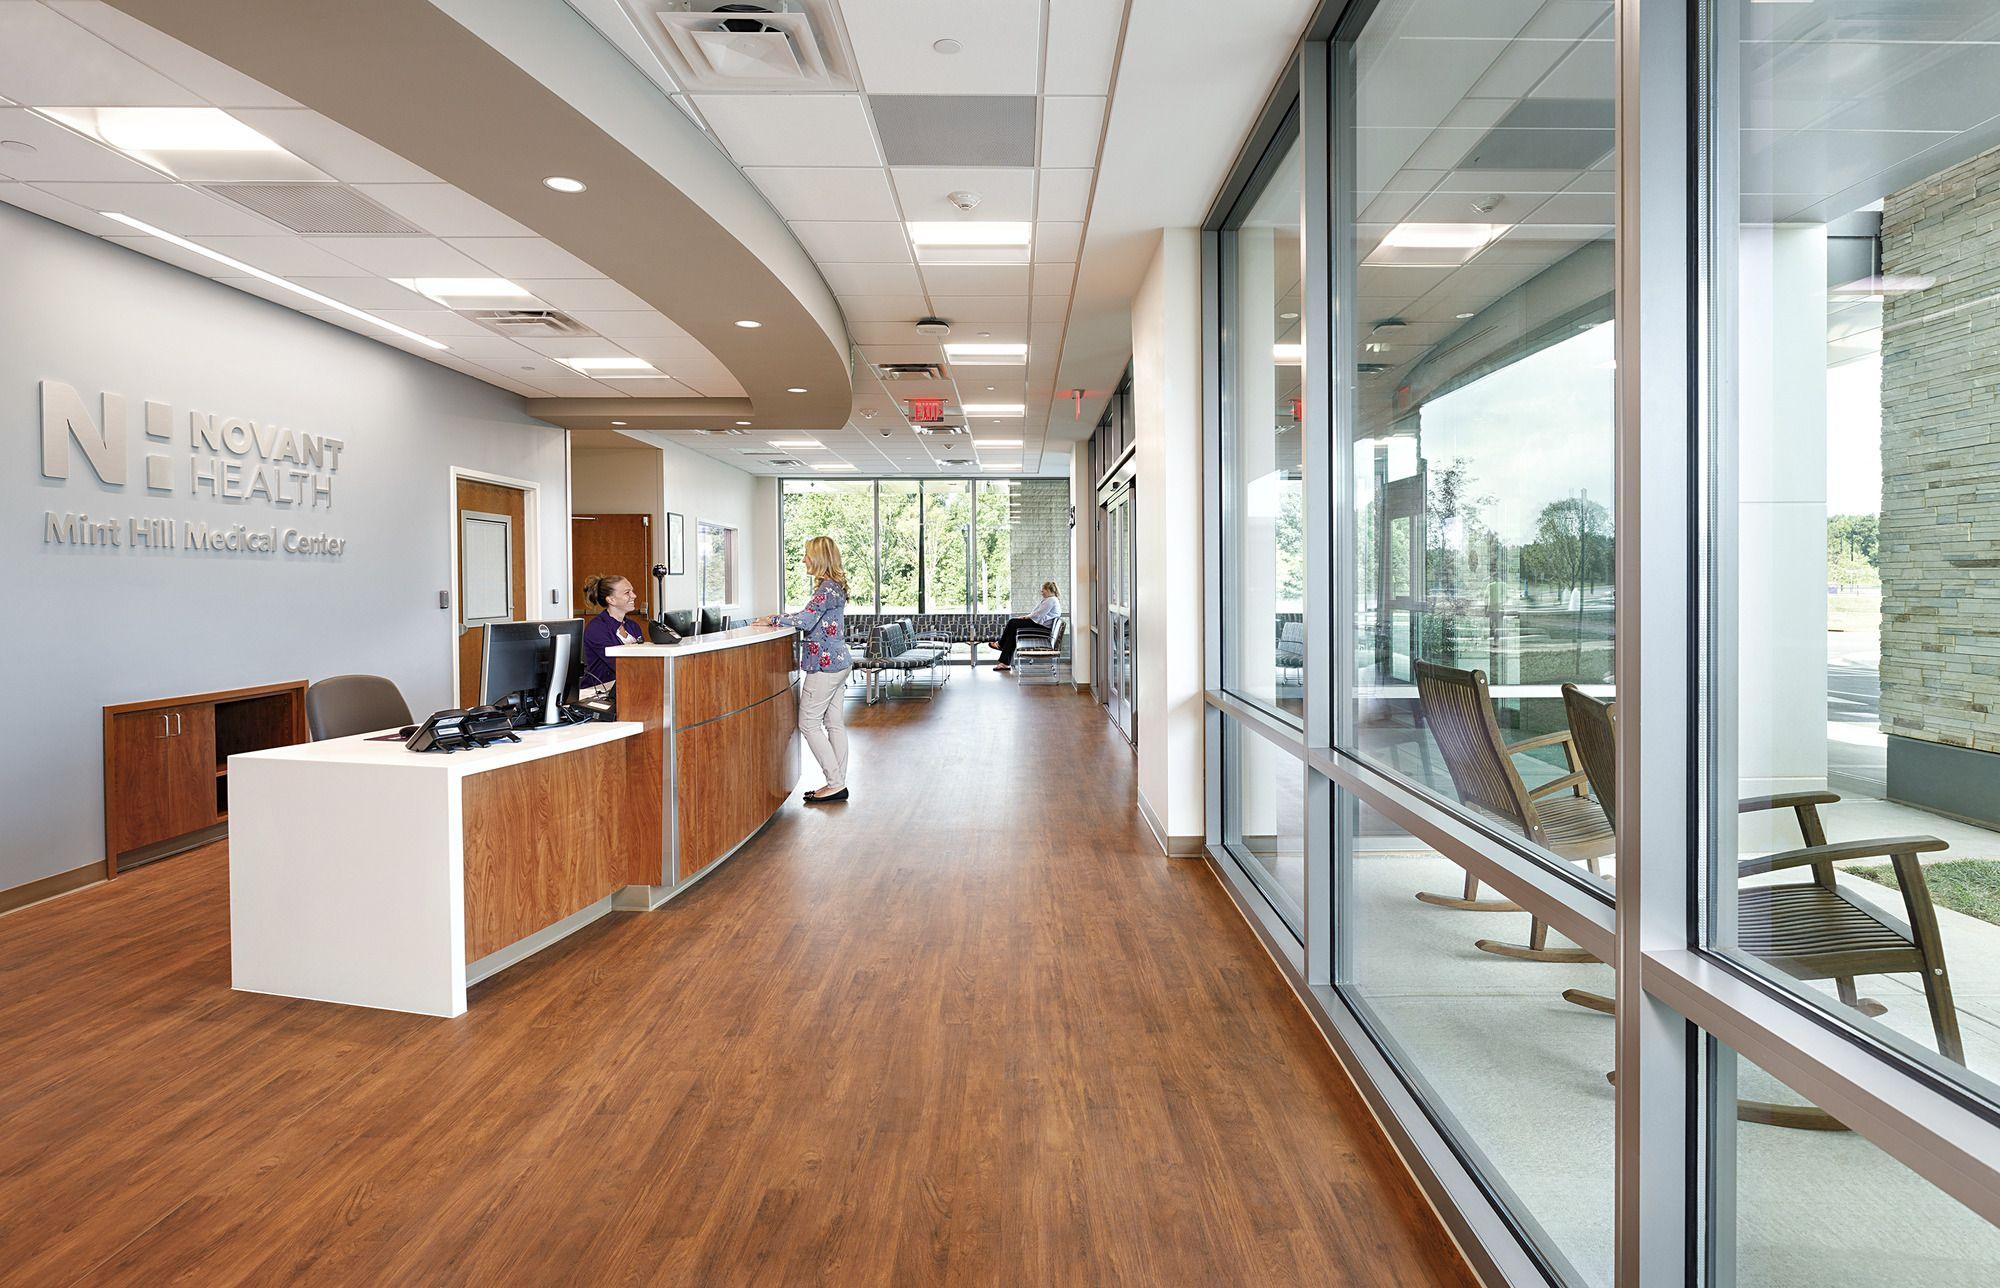 Photo Tour Novant Health Mint Mill Medical Center